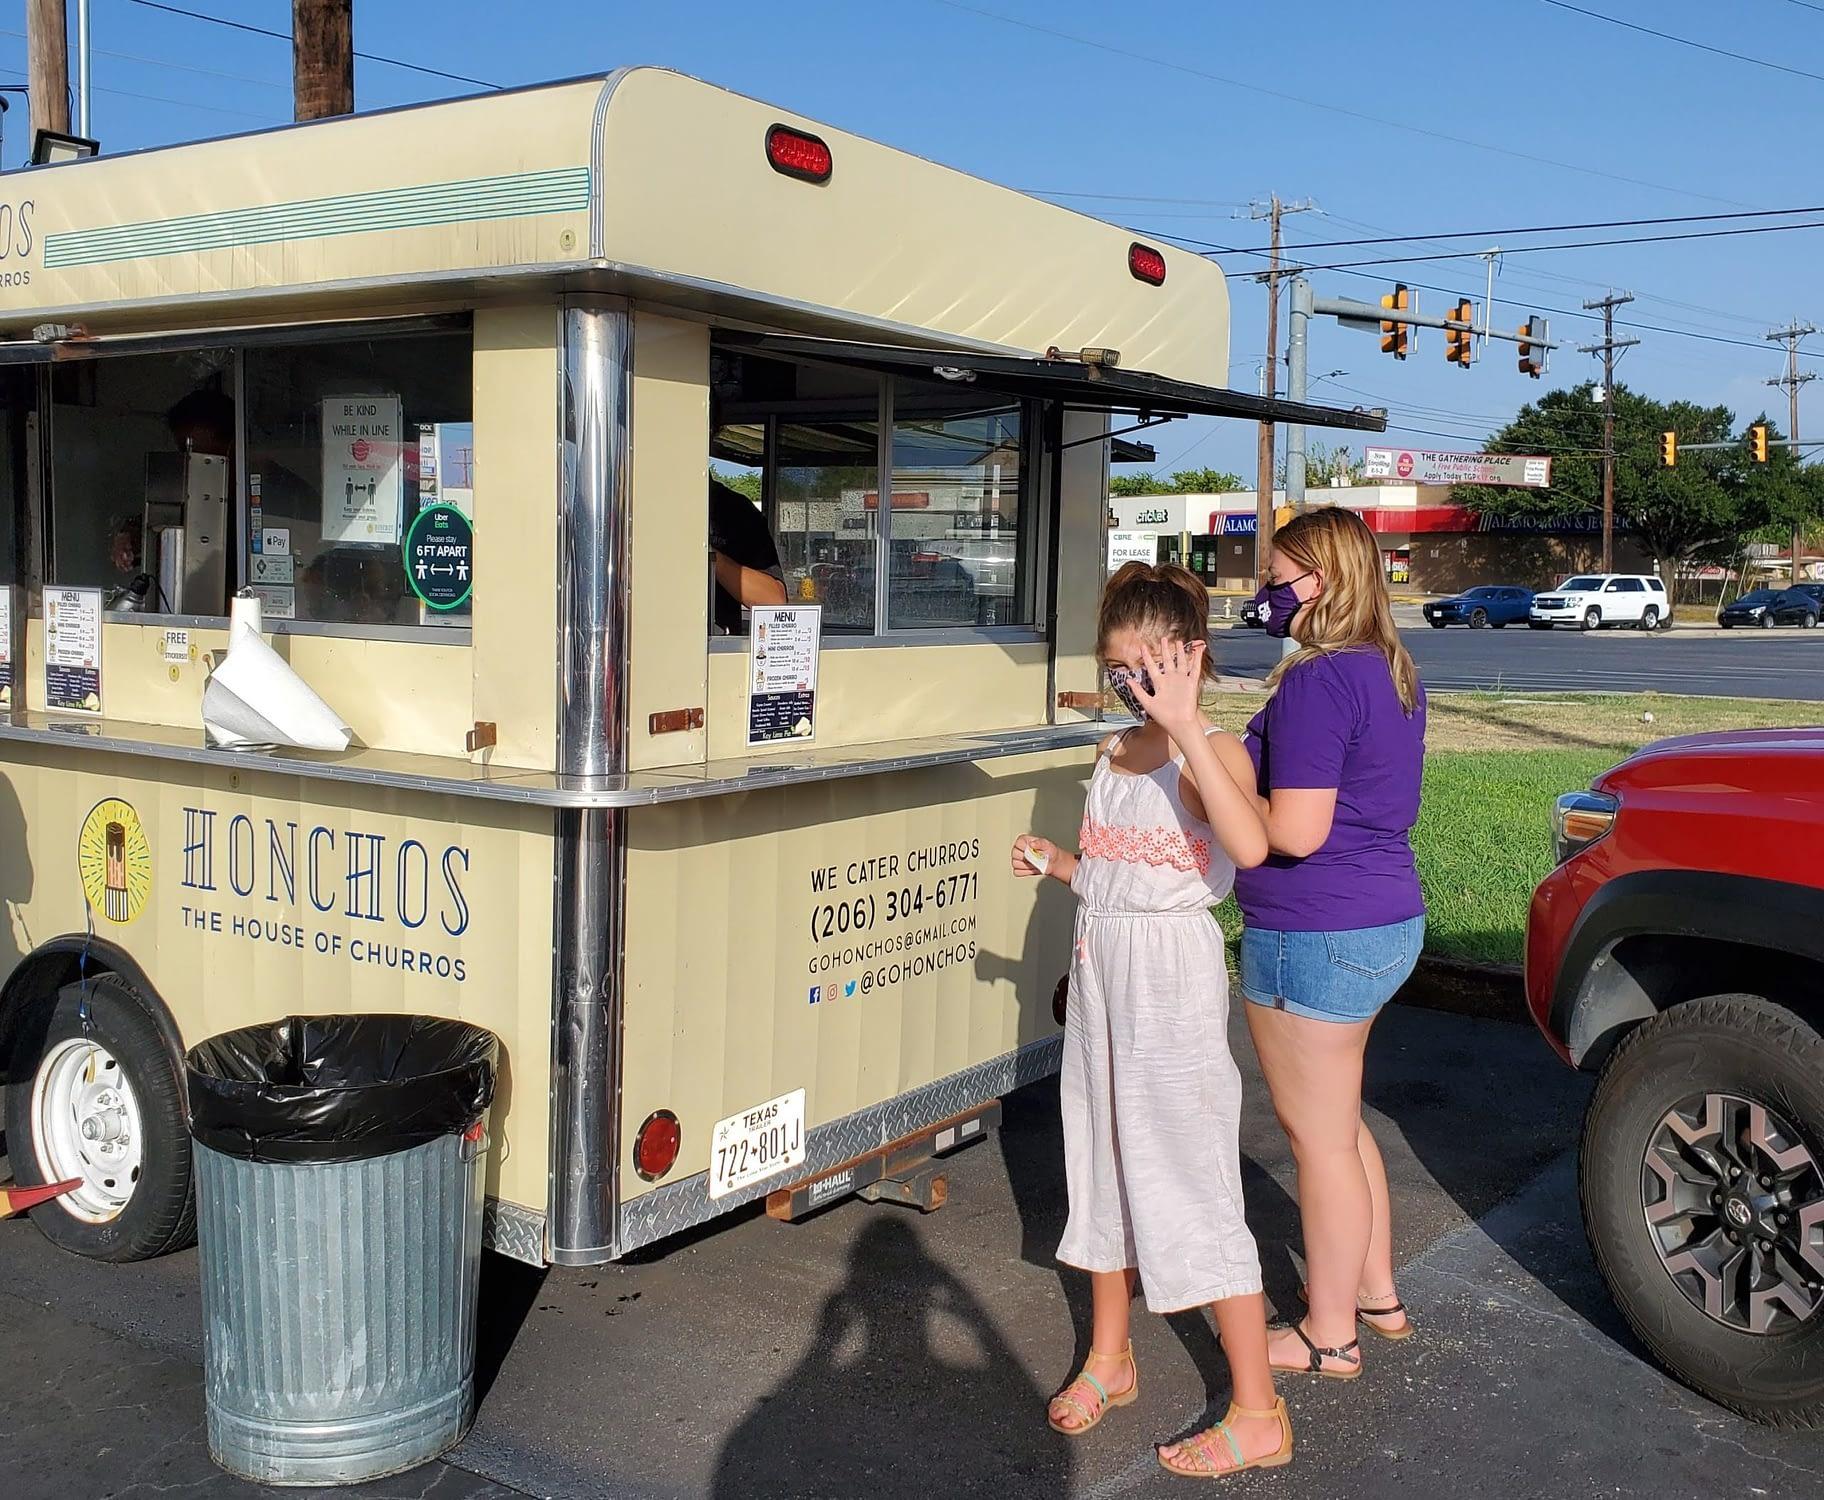 Honchos house of Churros food truck